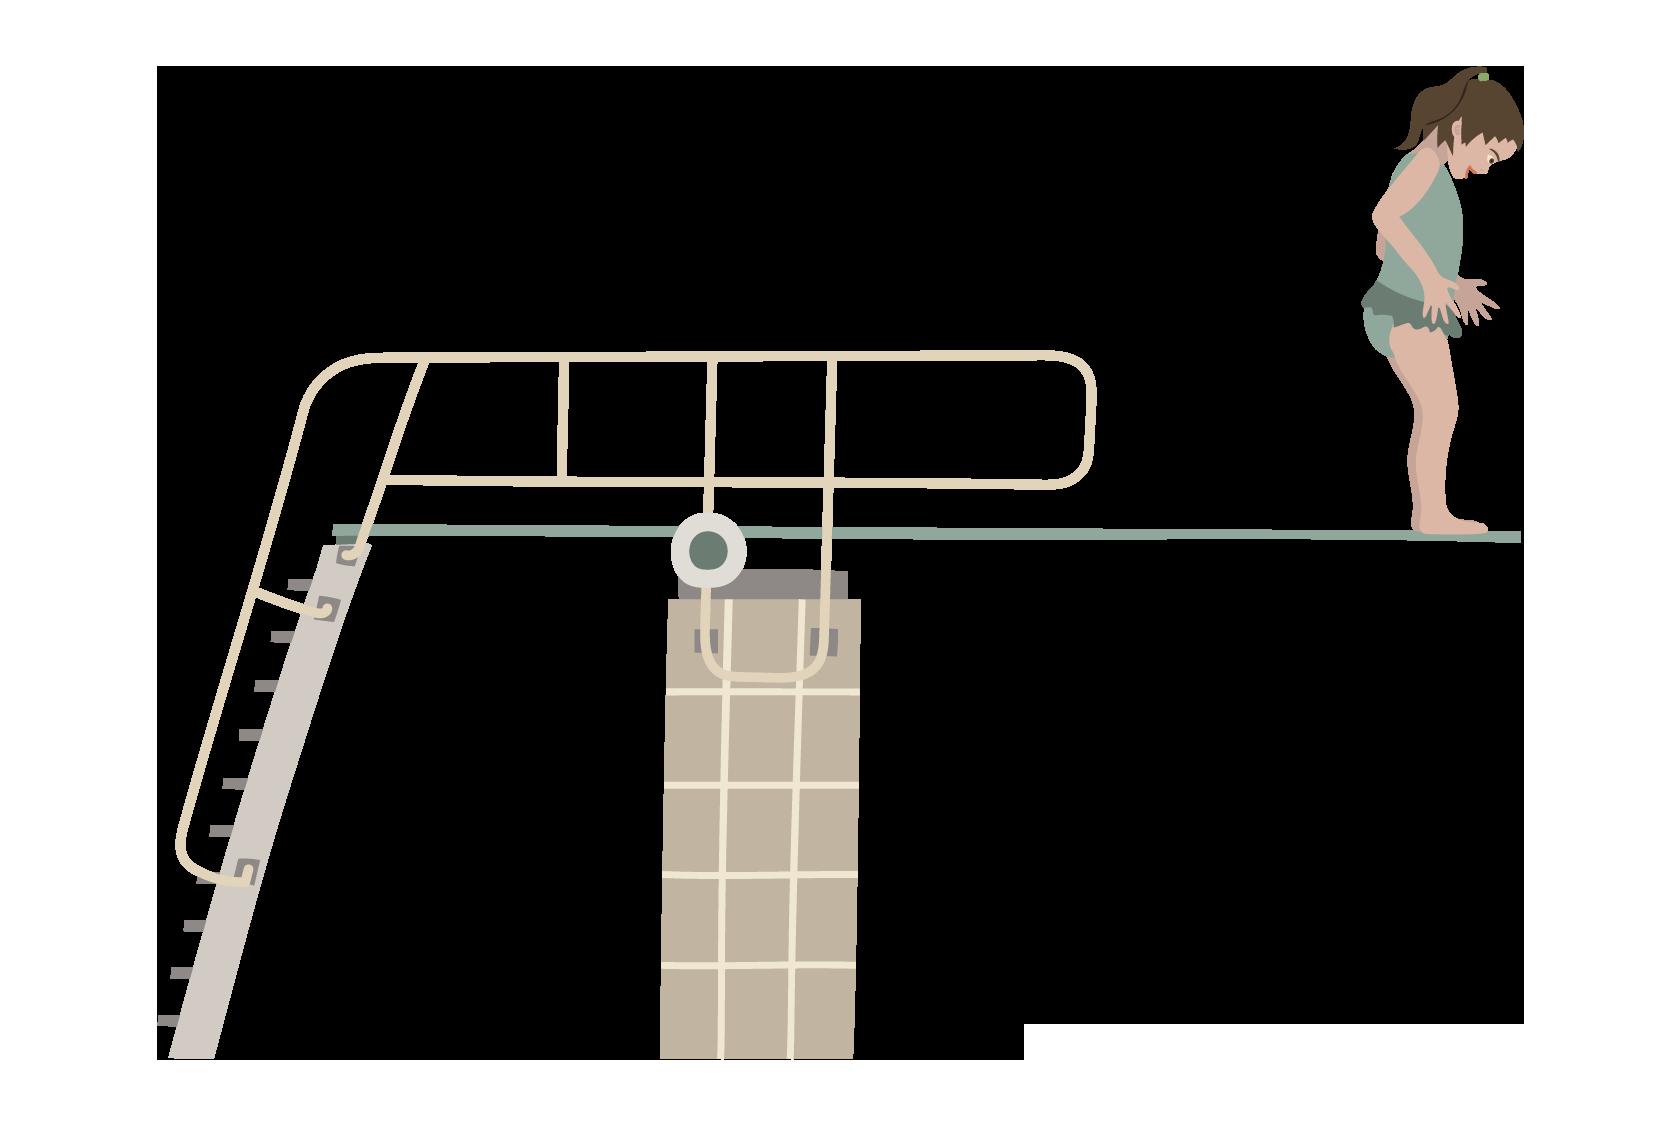 svømmehal vippe pige